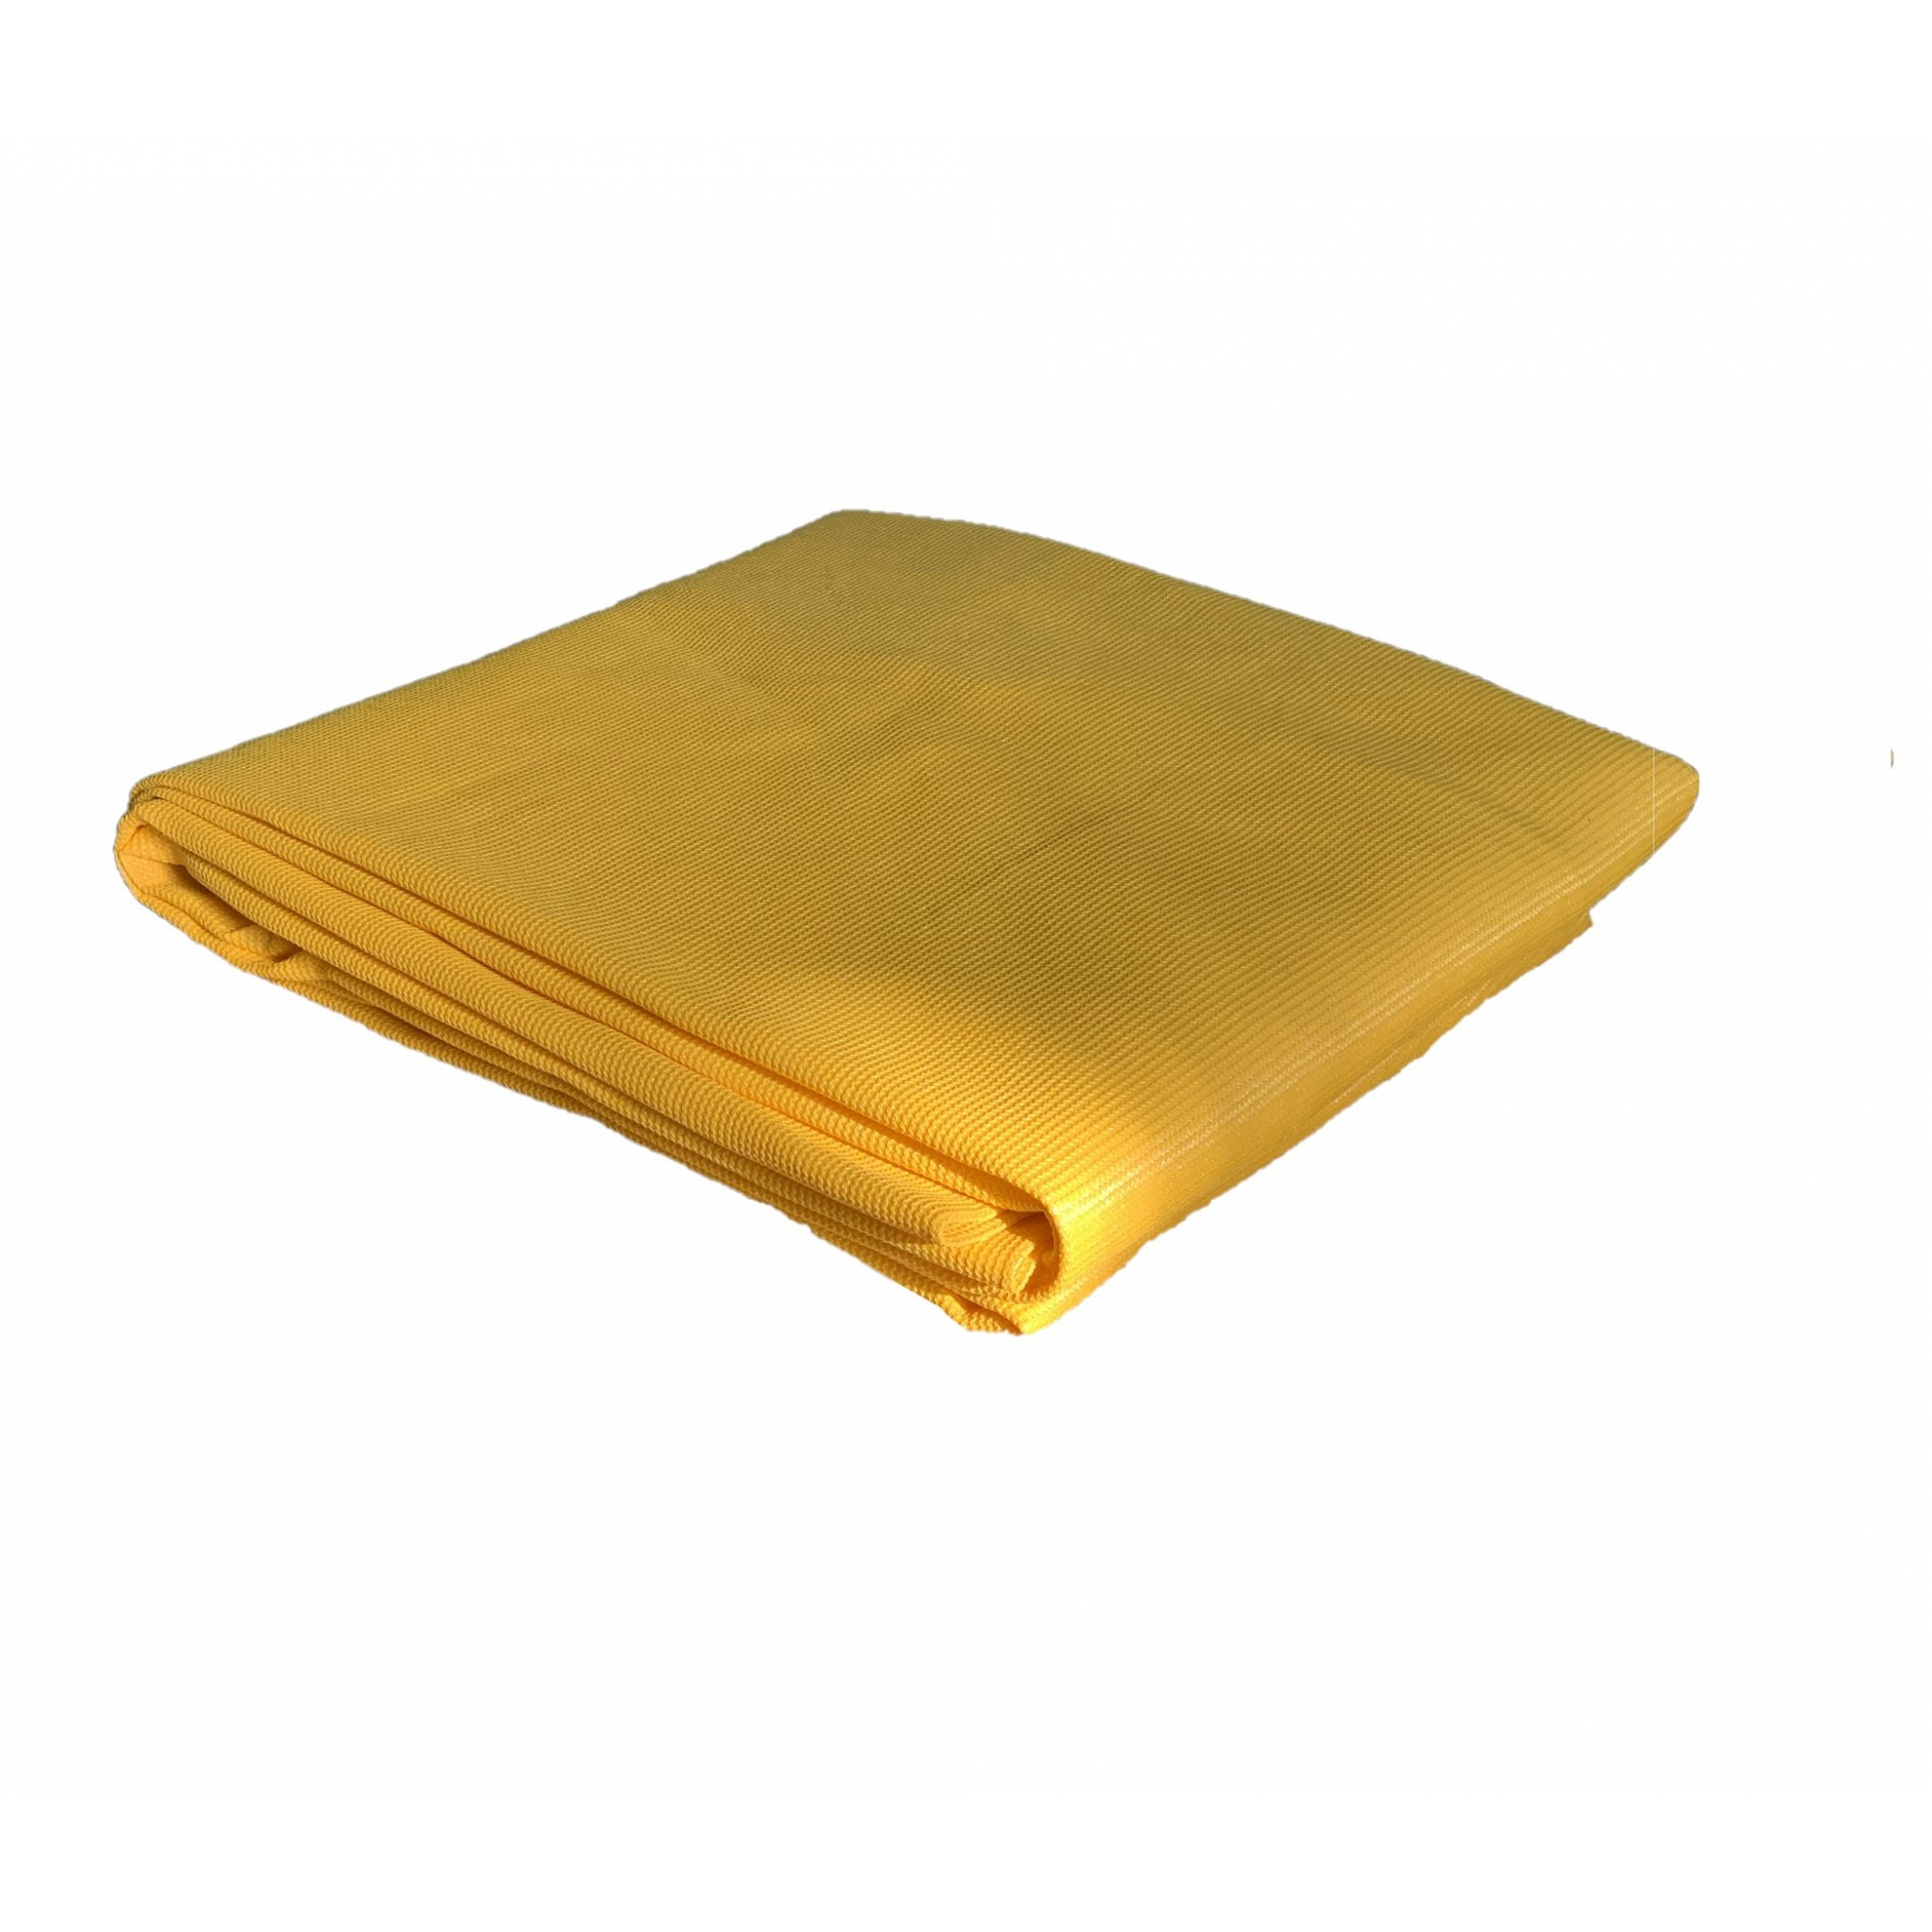 Tela De Sombreamento Decorativa Amarela 90% - 5,2 Metros X 20 Metros